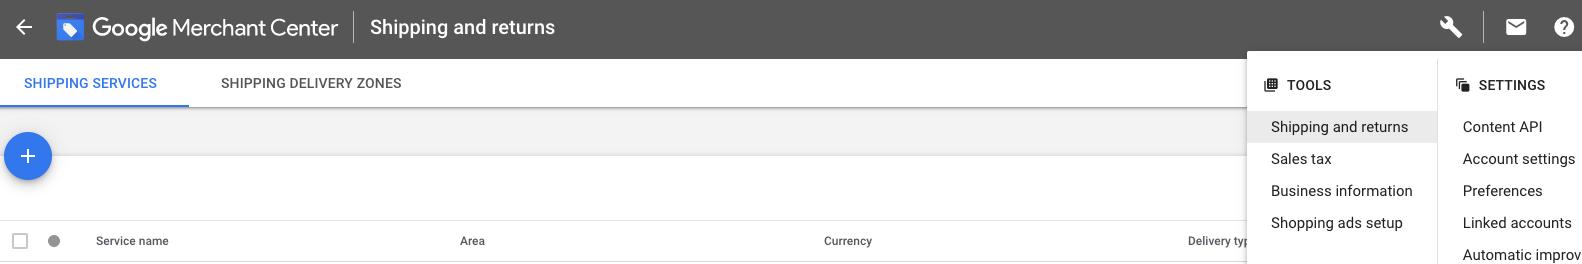 Google Merchant Center shipping